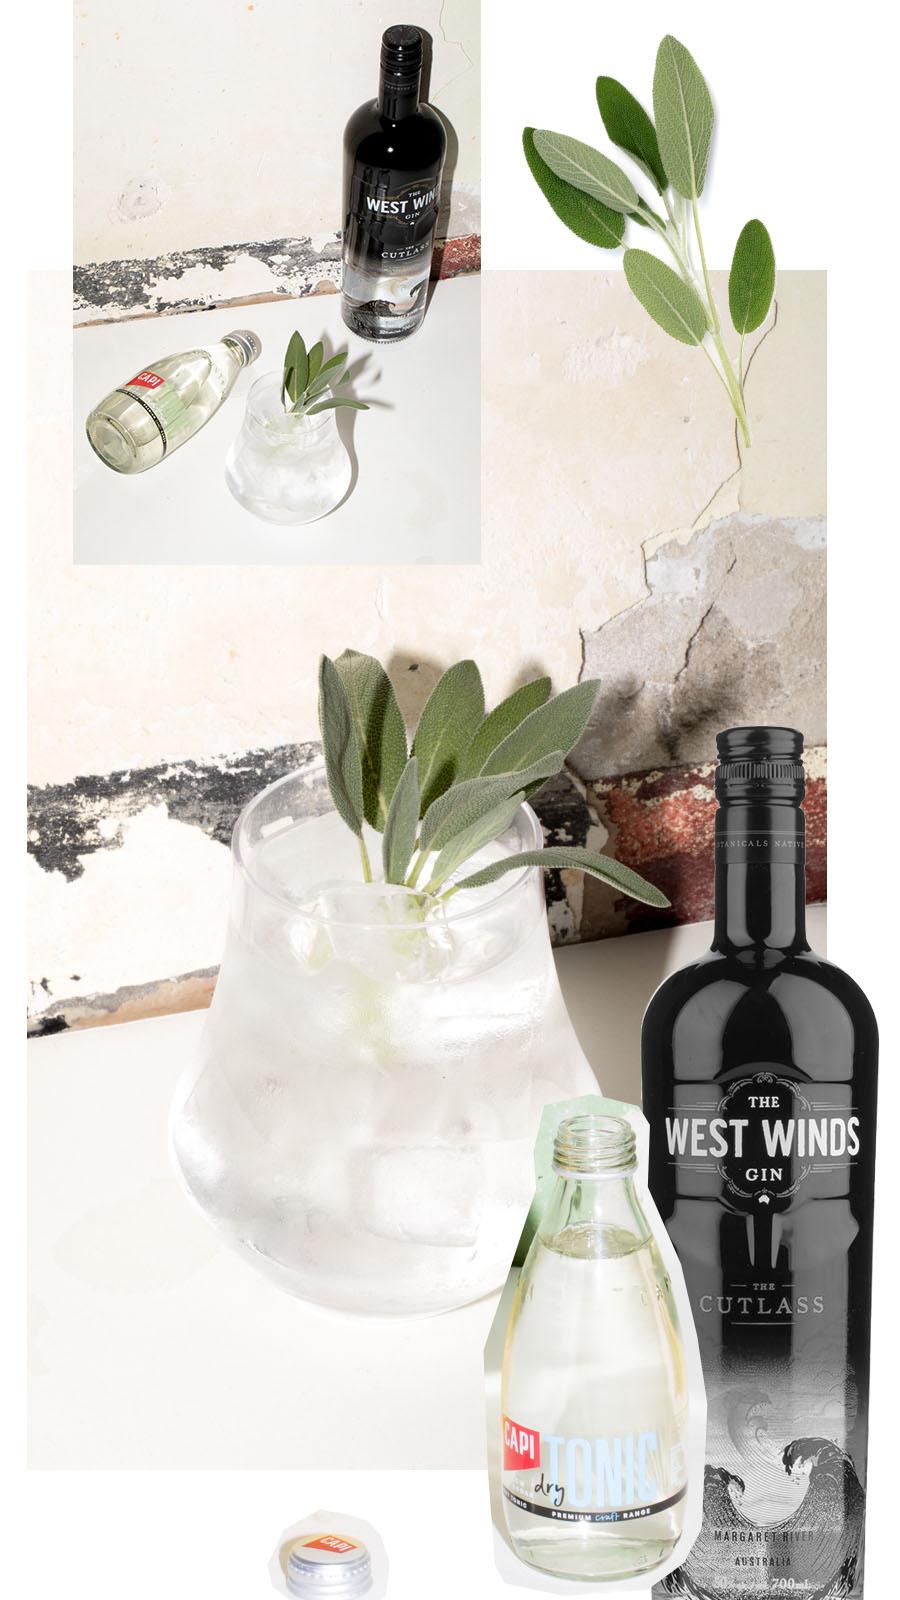 Week3_Westwinds Cutlass.jpg